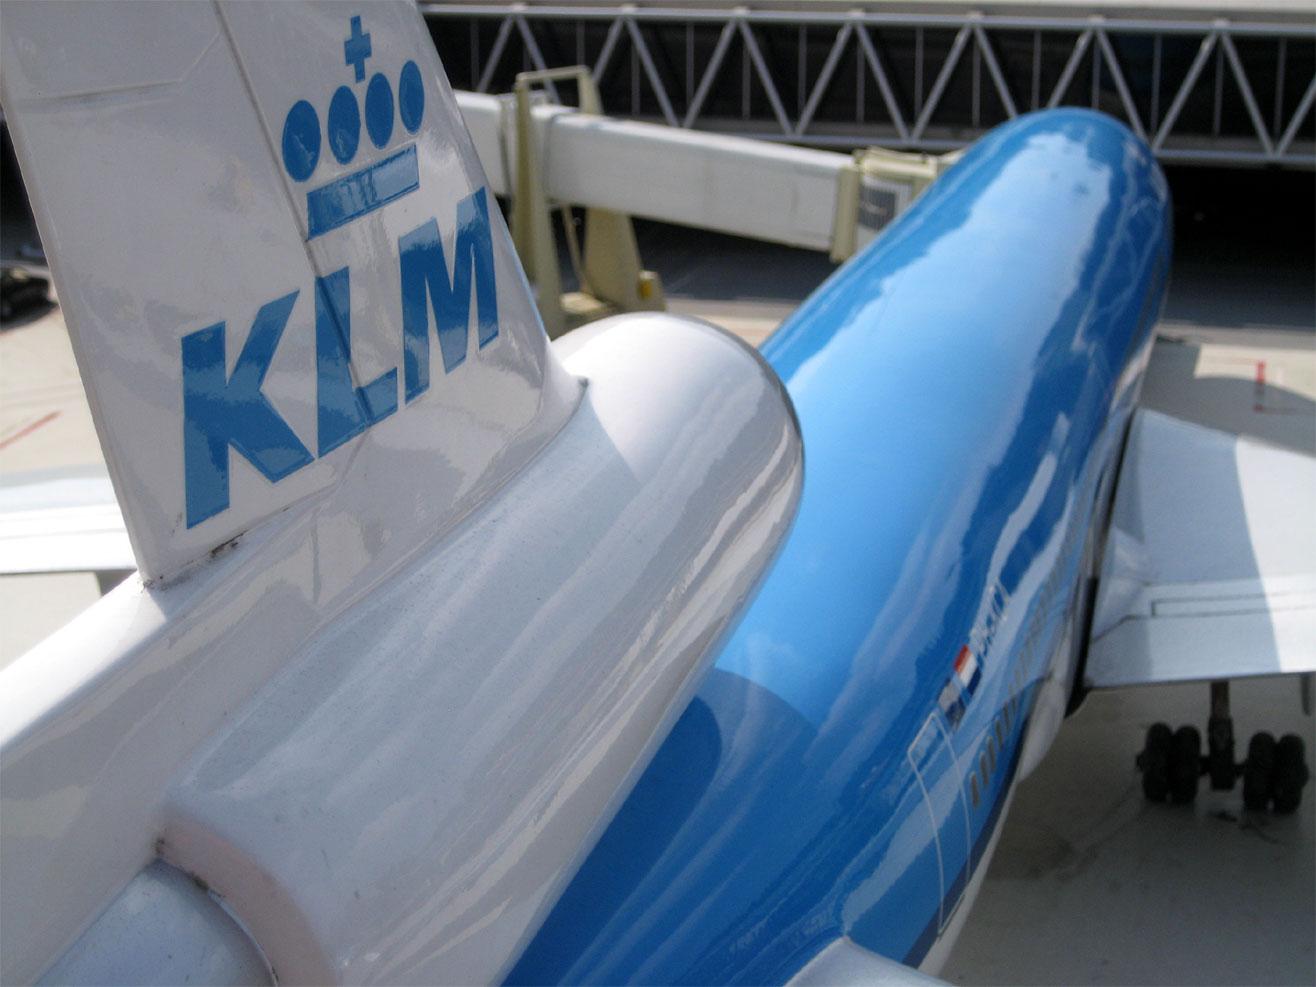 foto van KLM vliegtuig   fbf